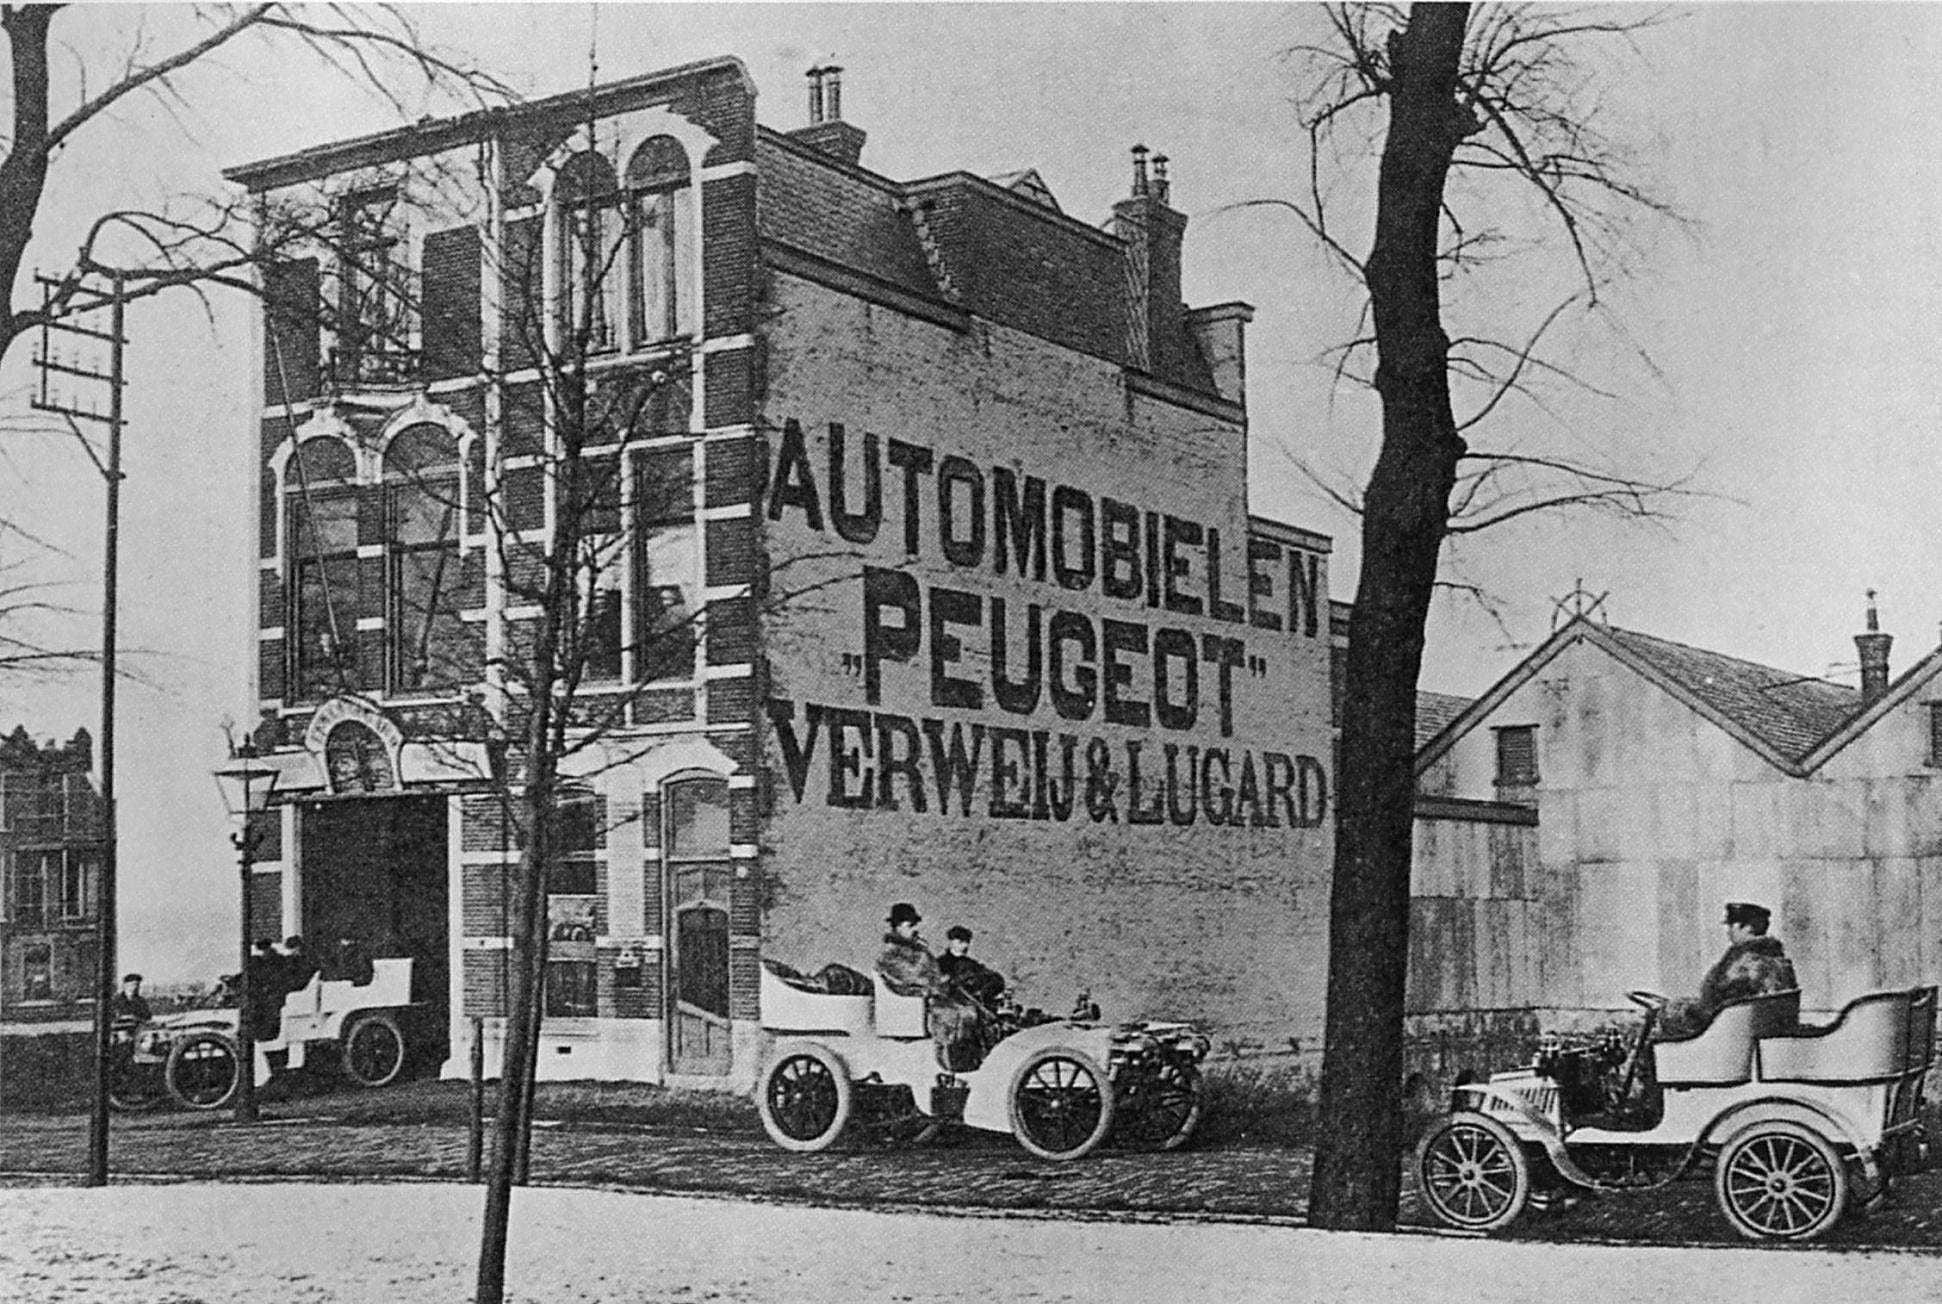 Peugeot-importeur--Haagse-laan-1903